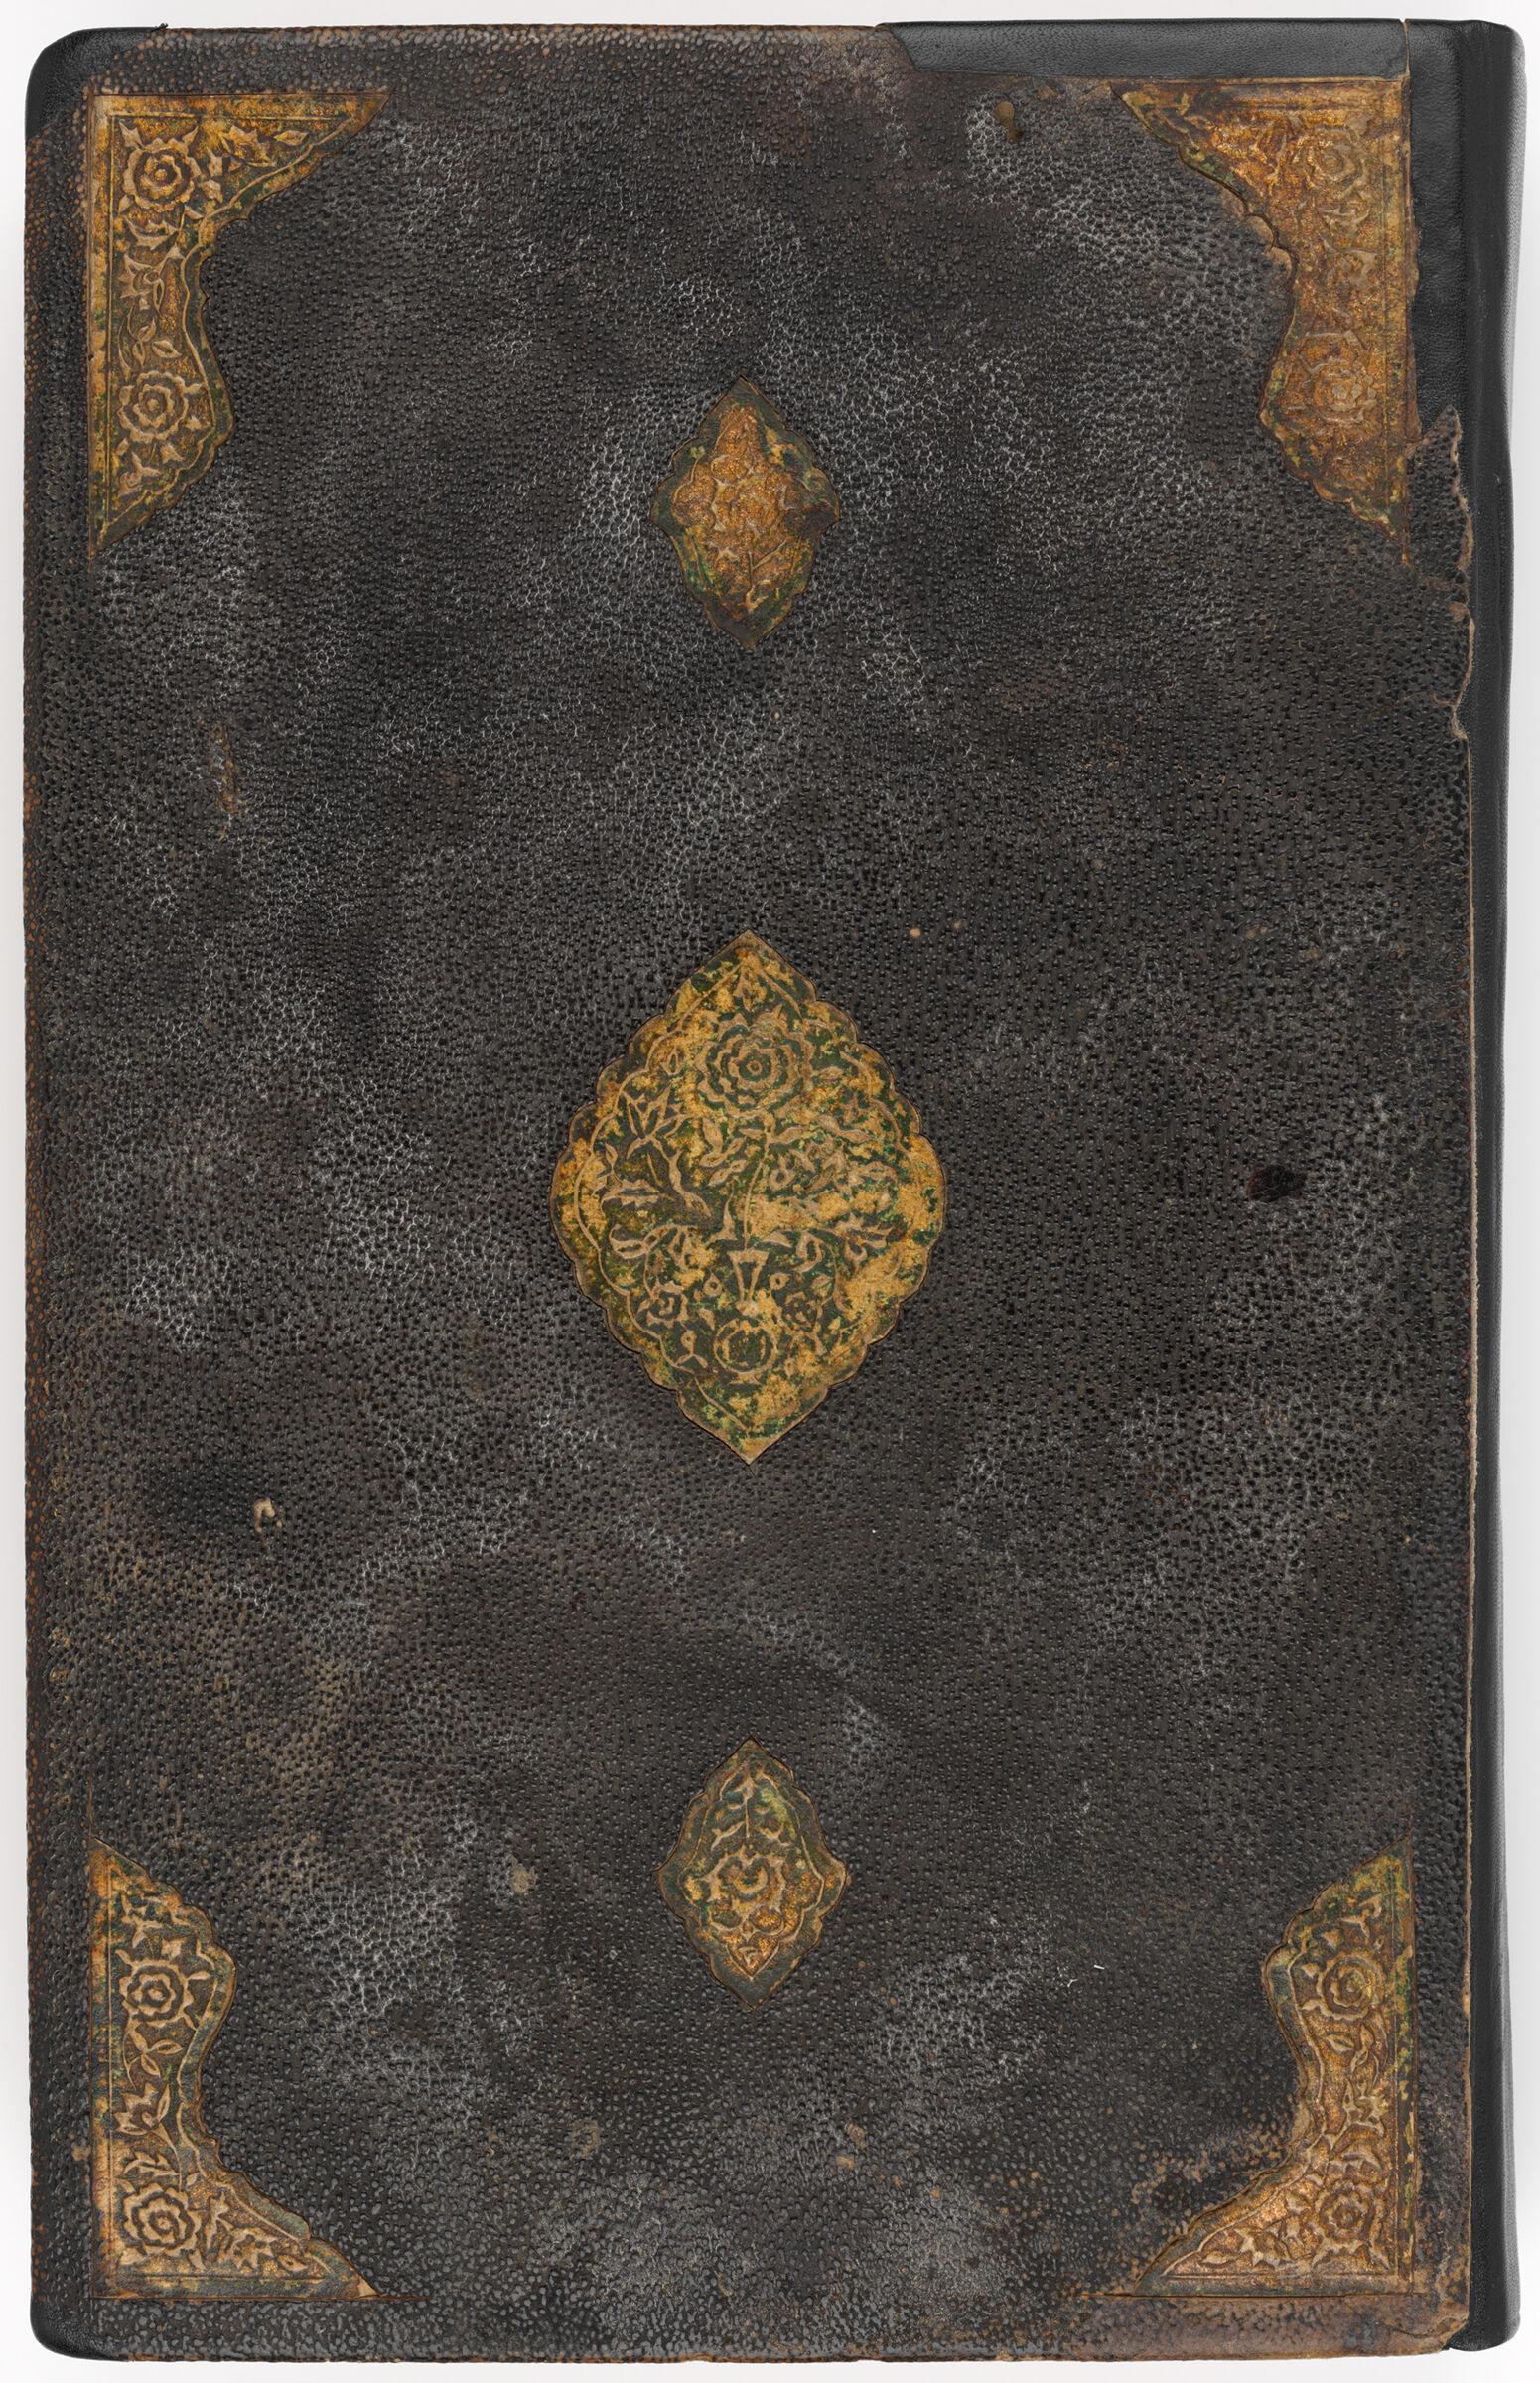 Illustrated Manuscript Of The Khamsa (Quintet) By Nizami